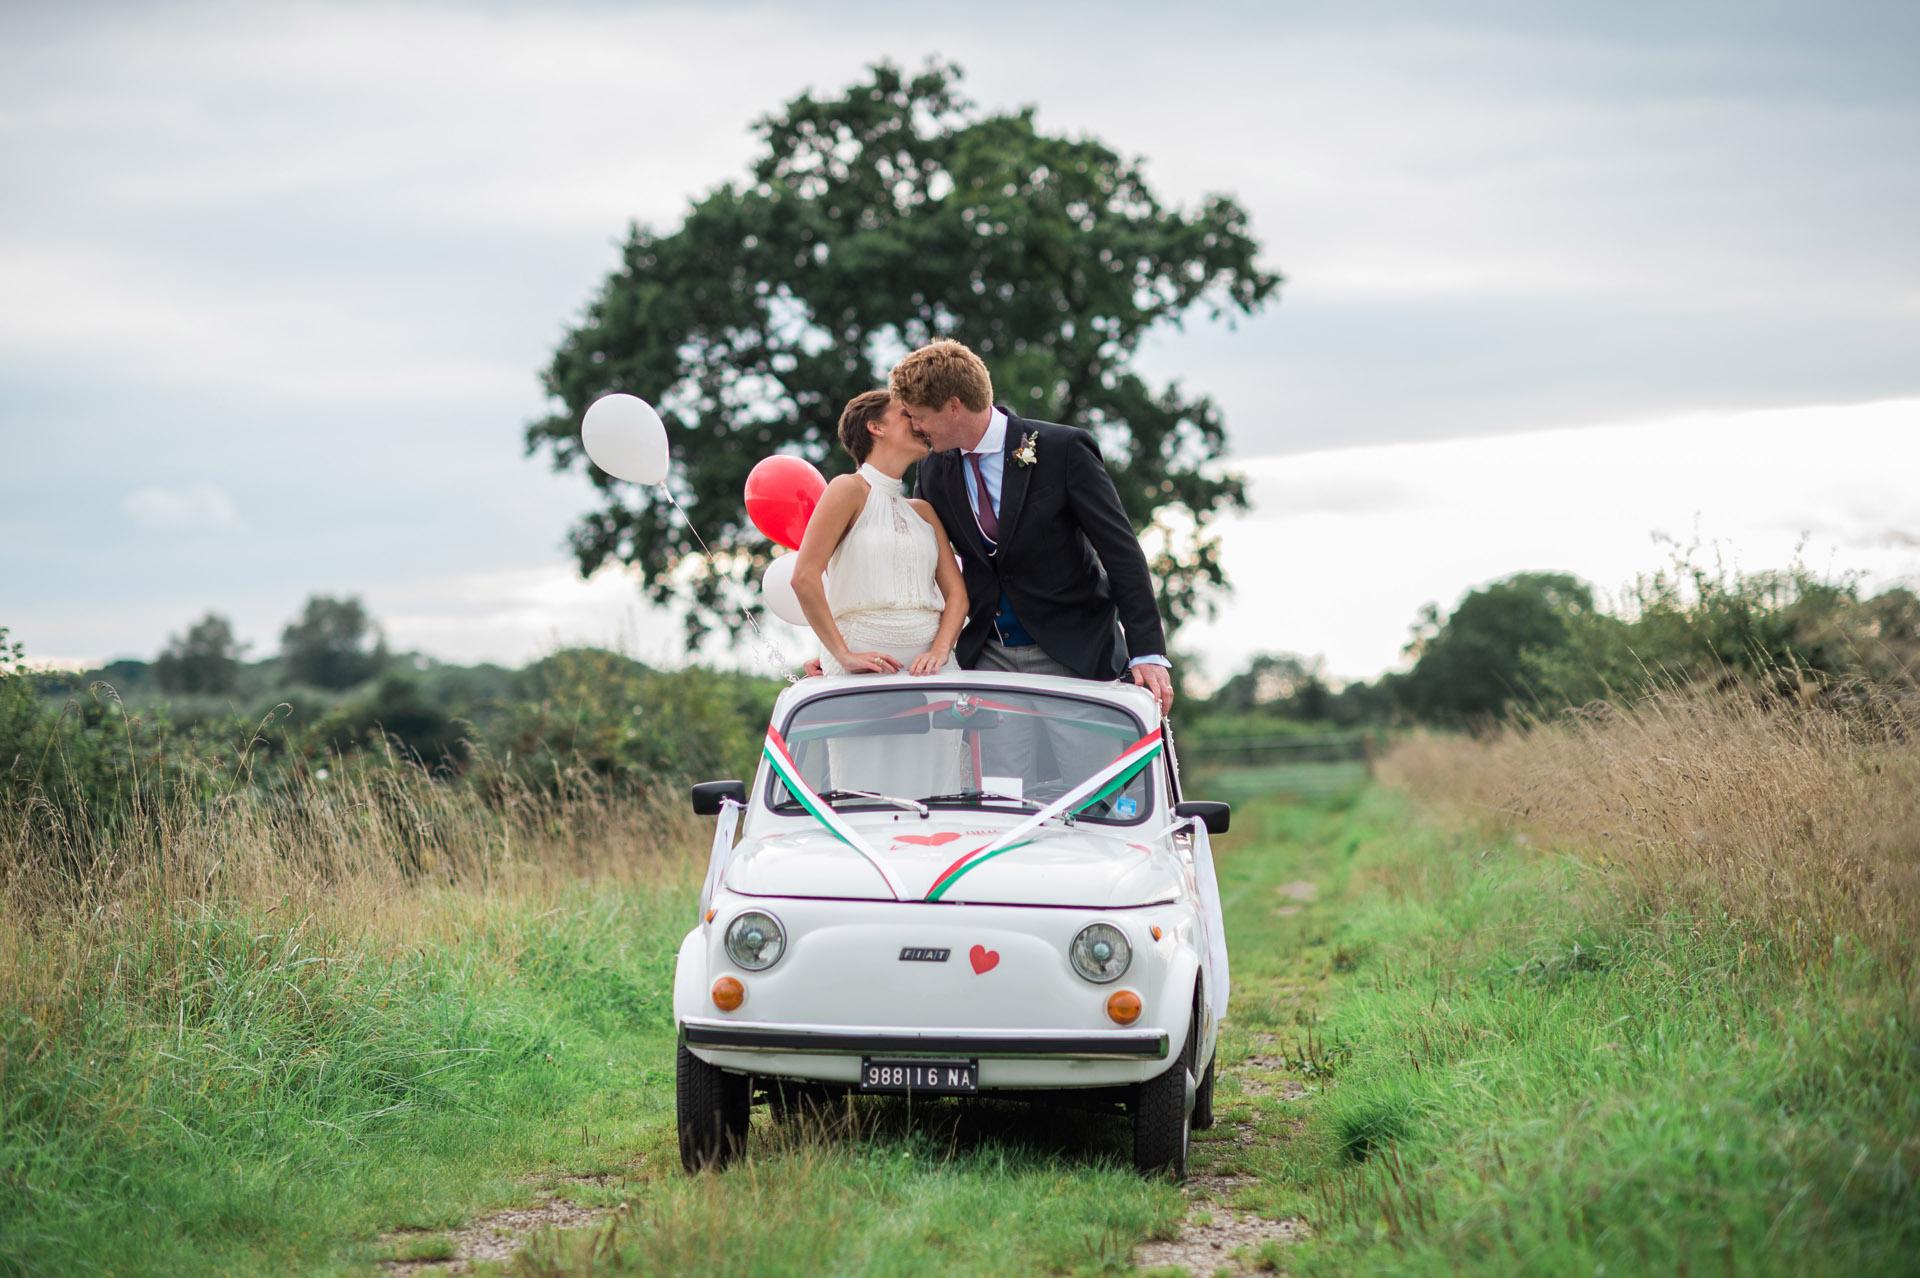 newlyweds in beetle car